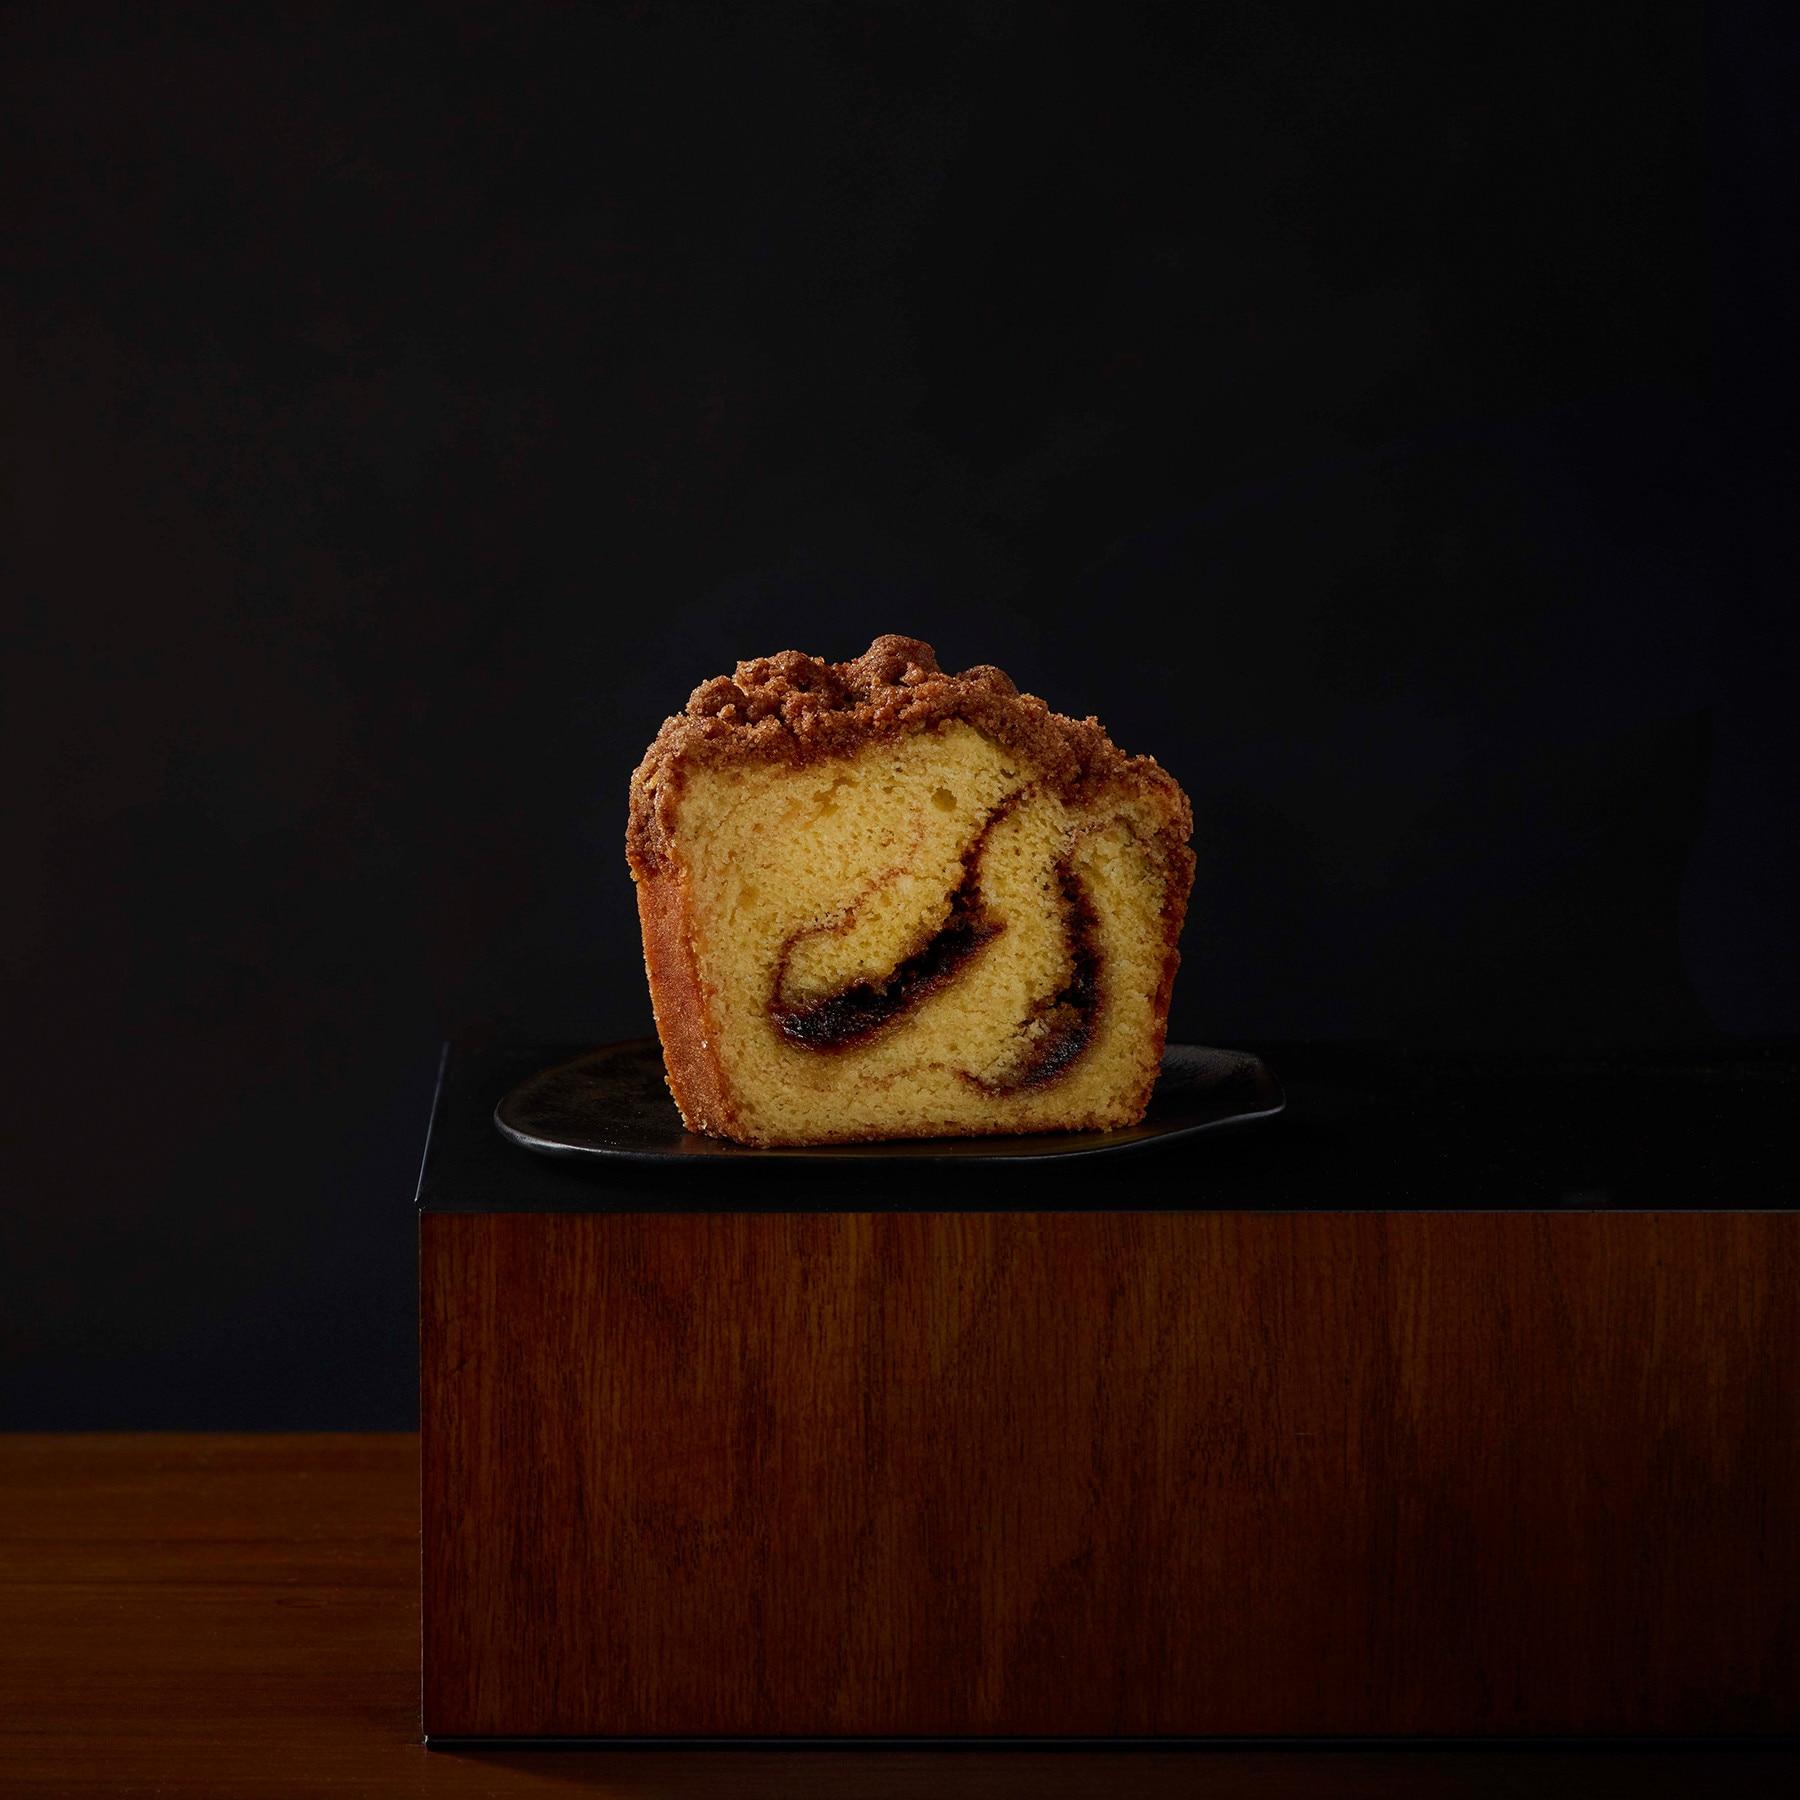 Starbucks cinnamon streusel coffee cake recipe